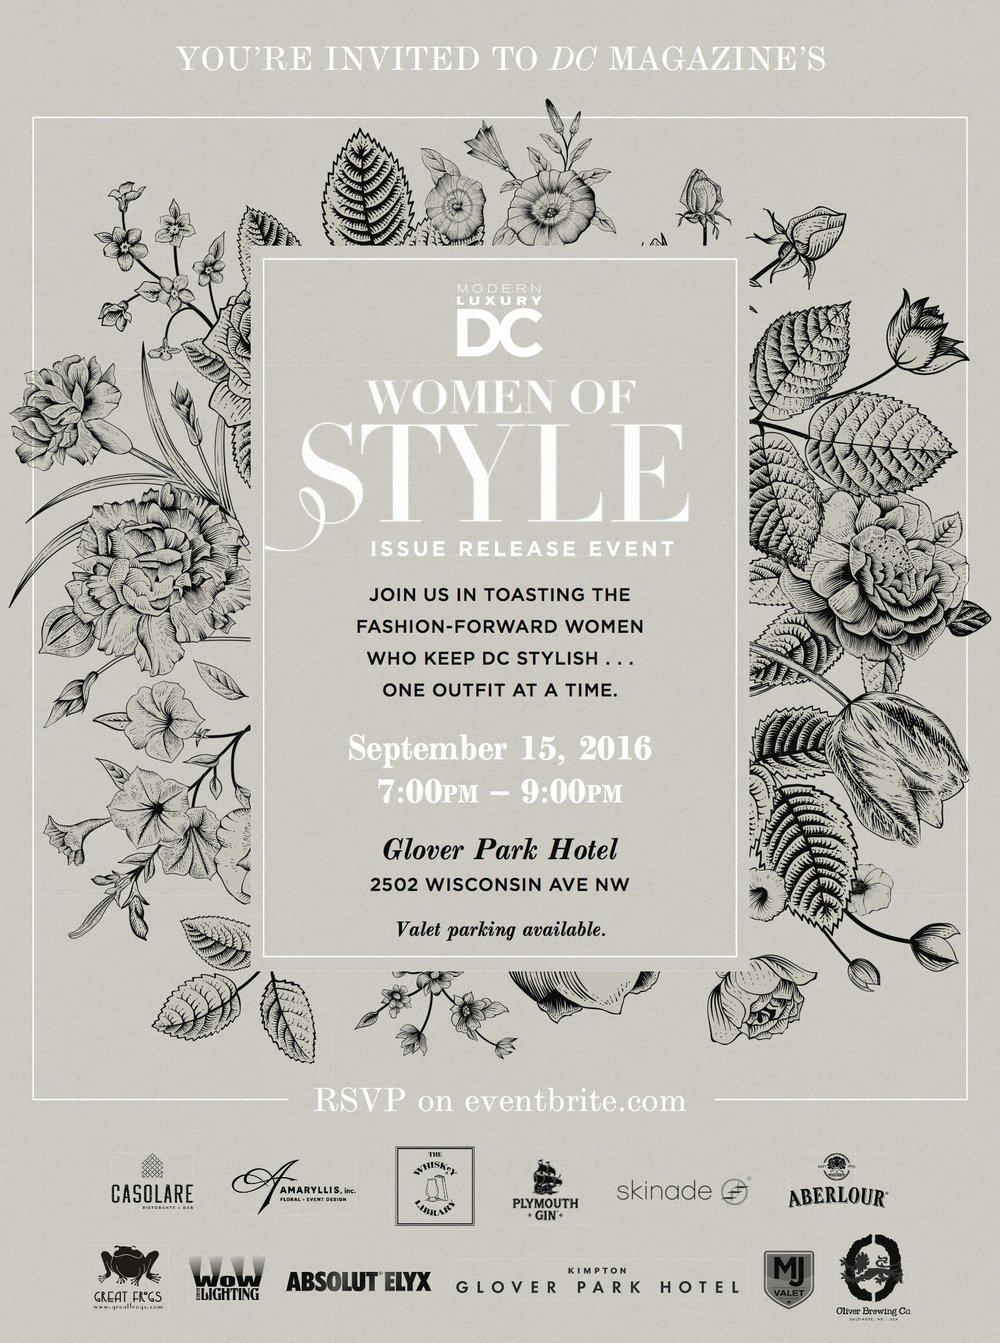 marketing_women of style event invite.jpg